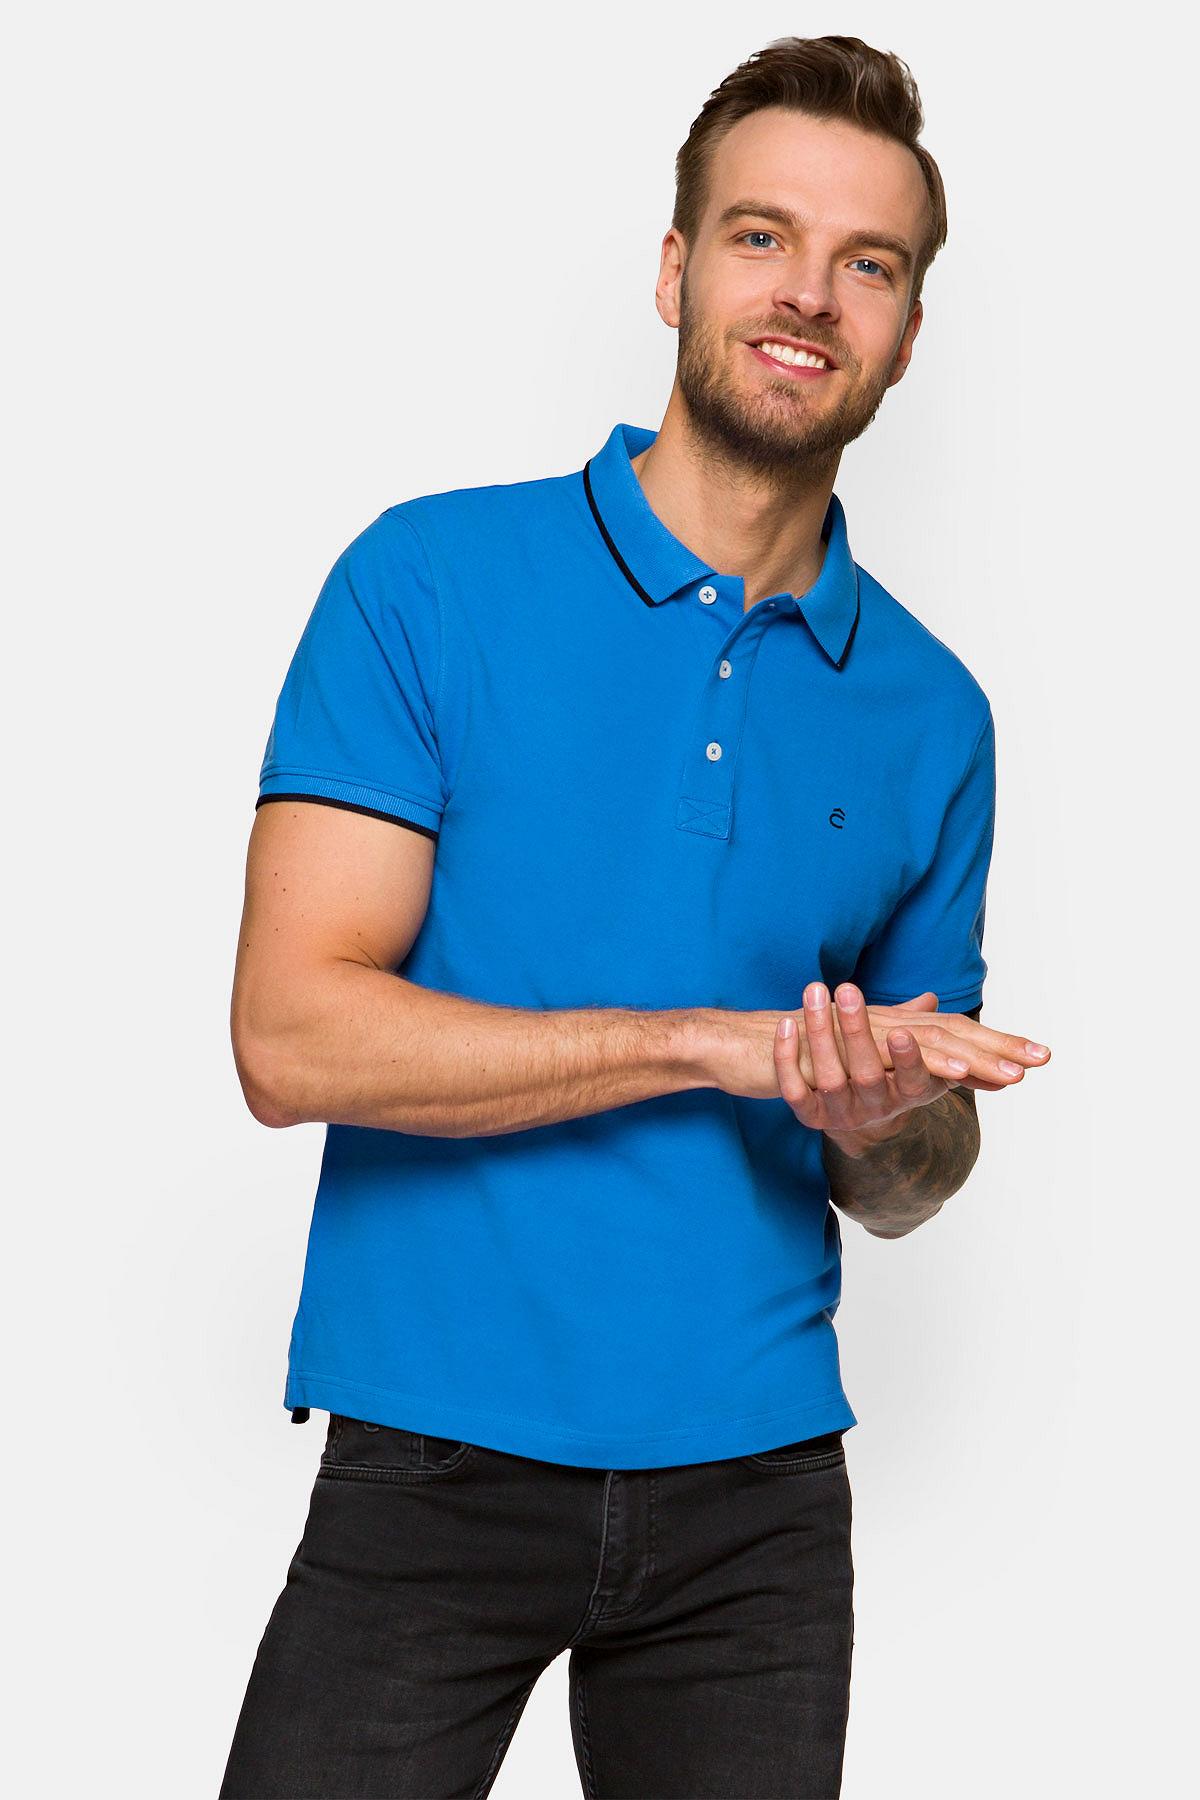 Koszulka Niebieska Polo Dominic rozmiar 2XL; 3XL; L; M; XL